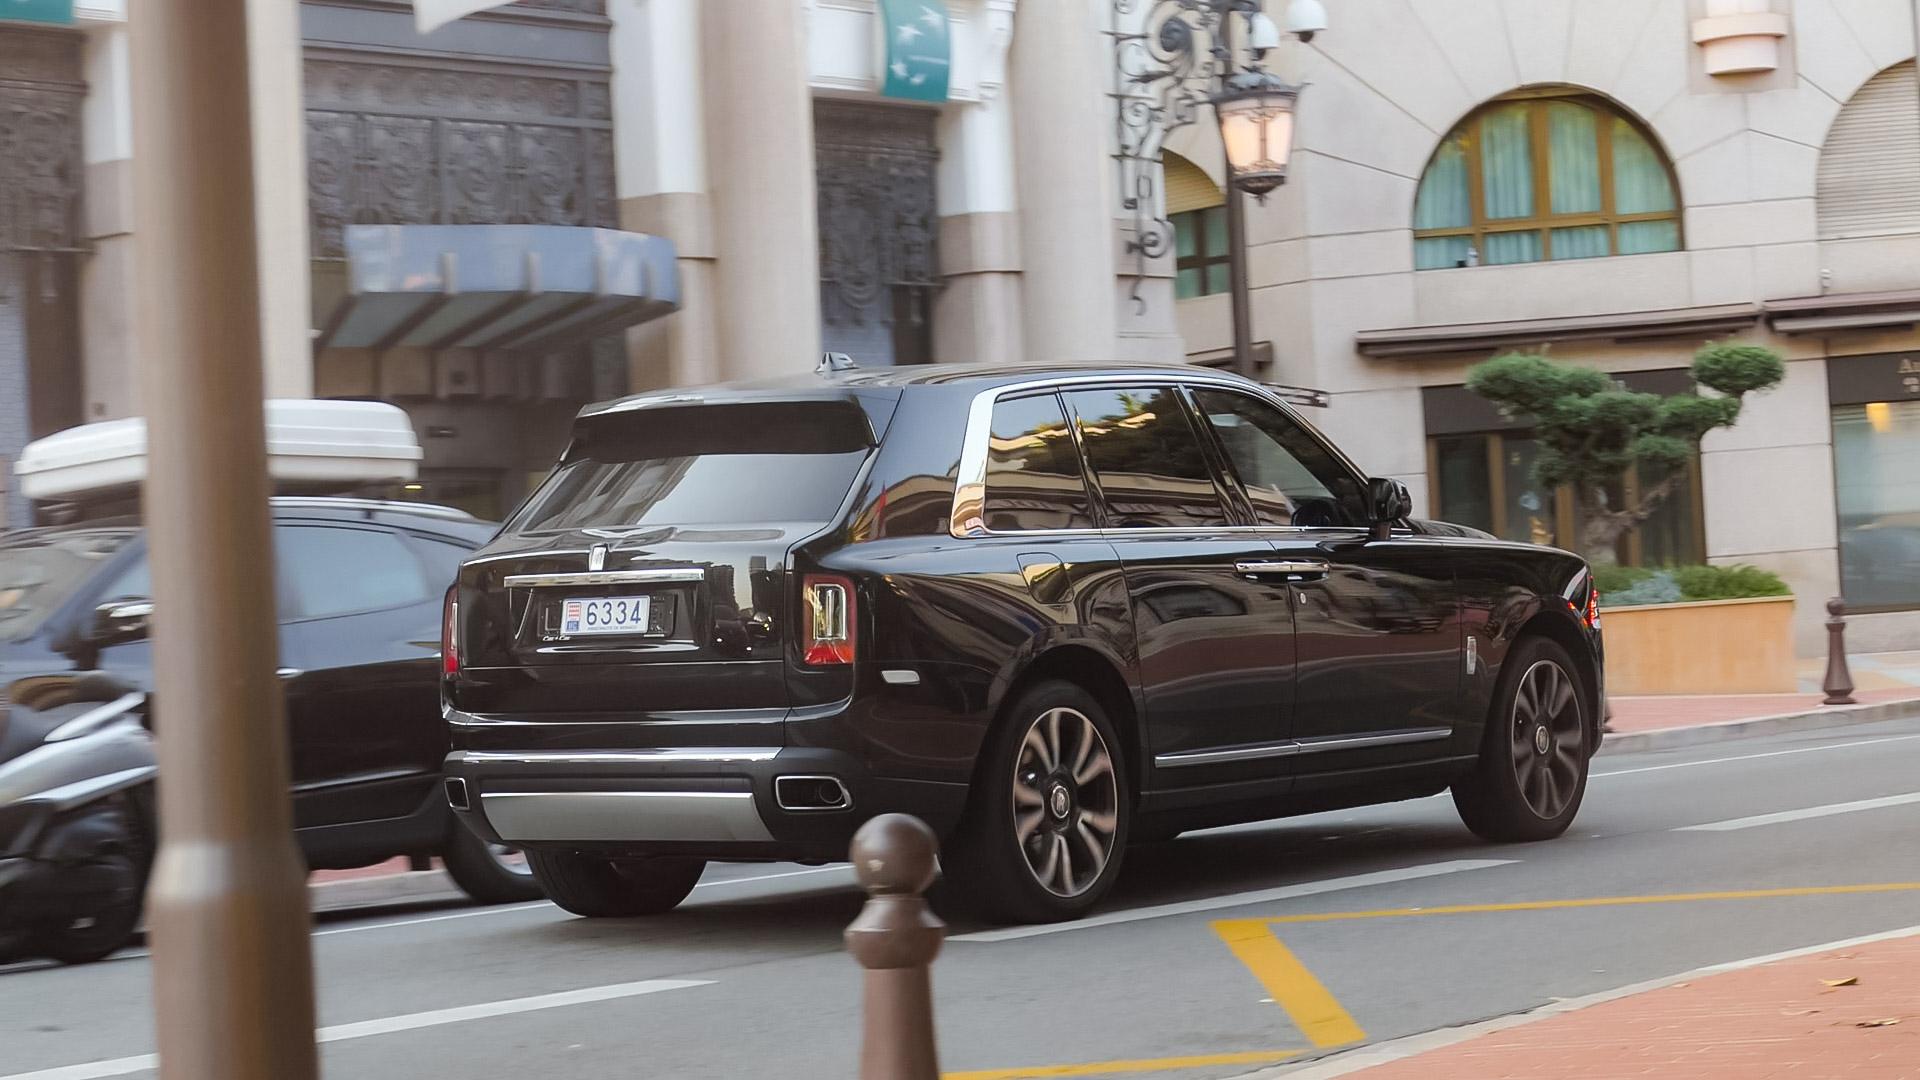 Rolls Royce Cullinan - 6334 (MC)